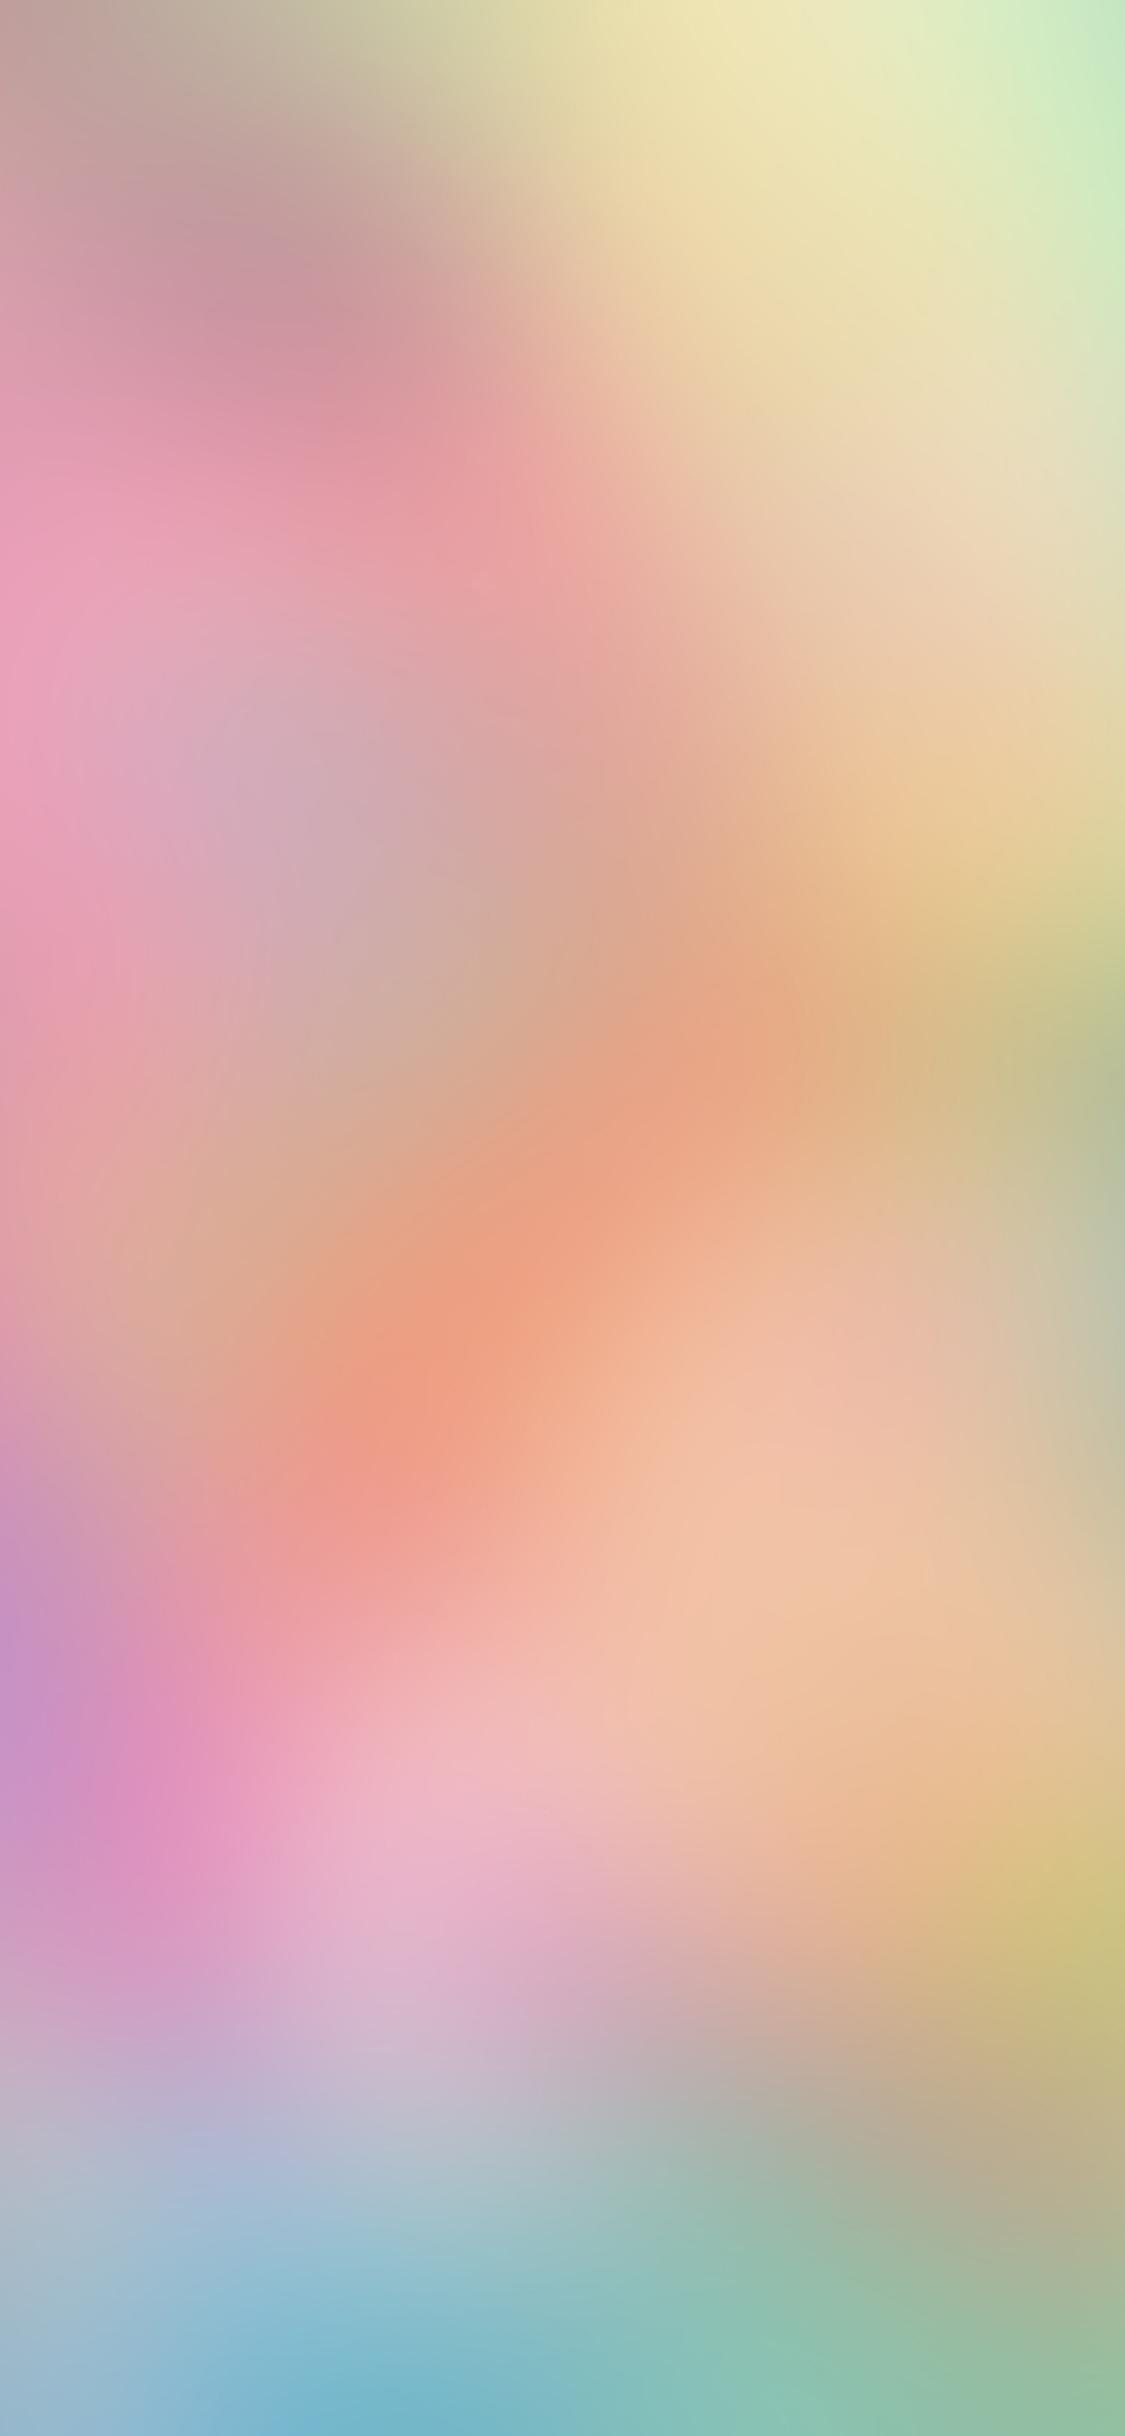 iPhoneXpapers.com-Apple-iPhone-wallpaper-sd78-wonderful-world-gradation-blur